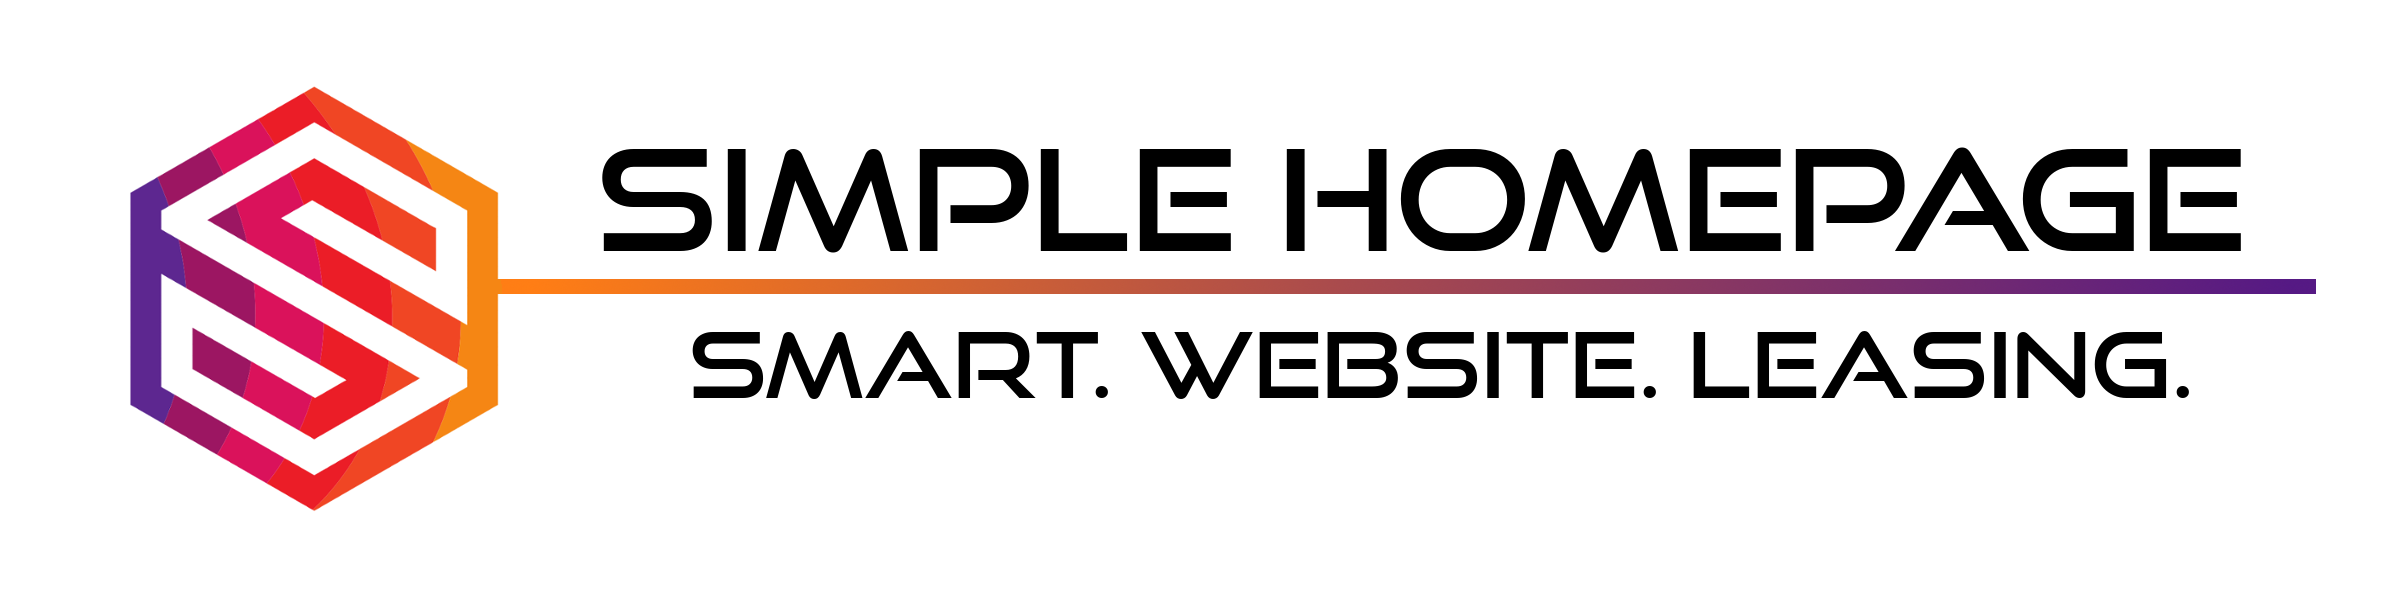 Werbeagentur Bielefeld Logo